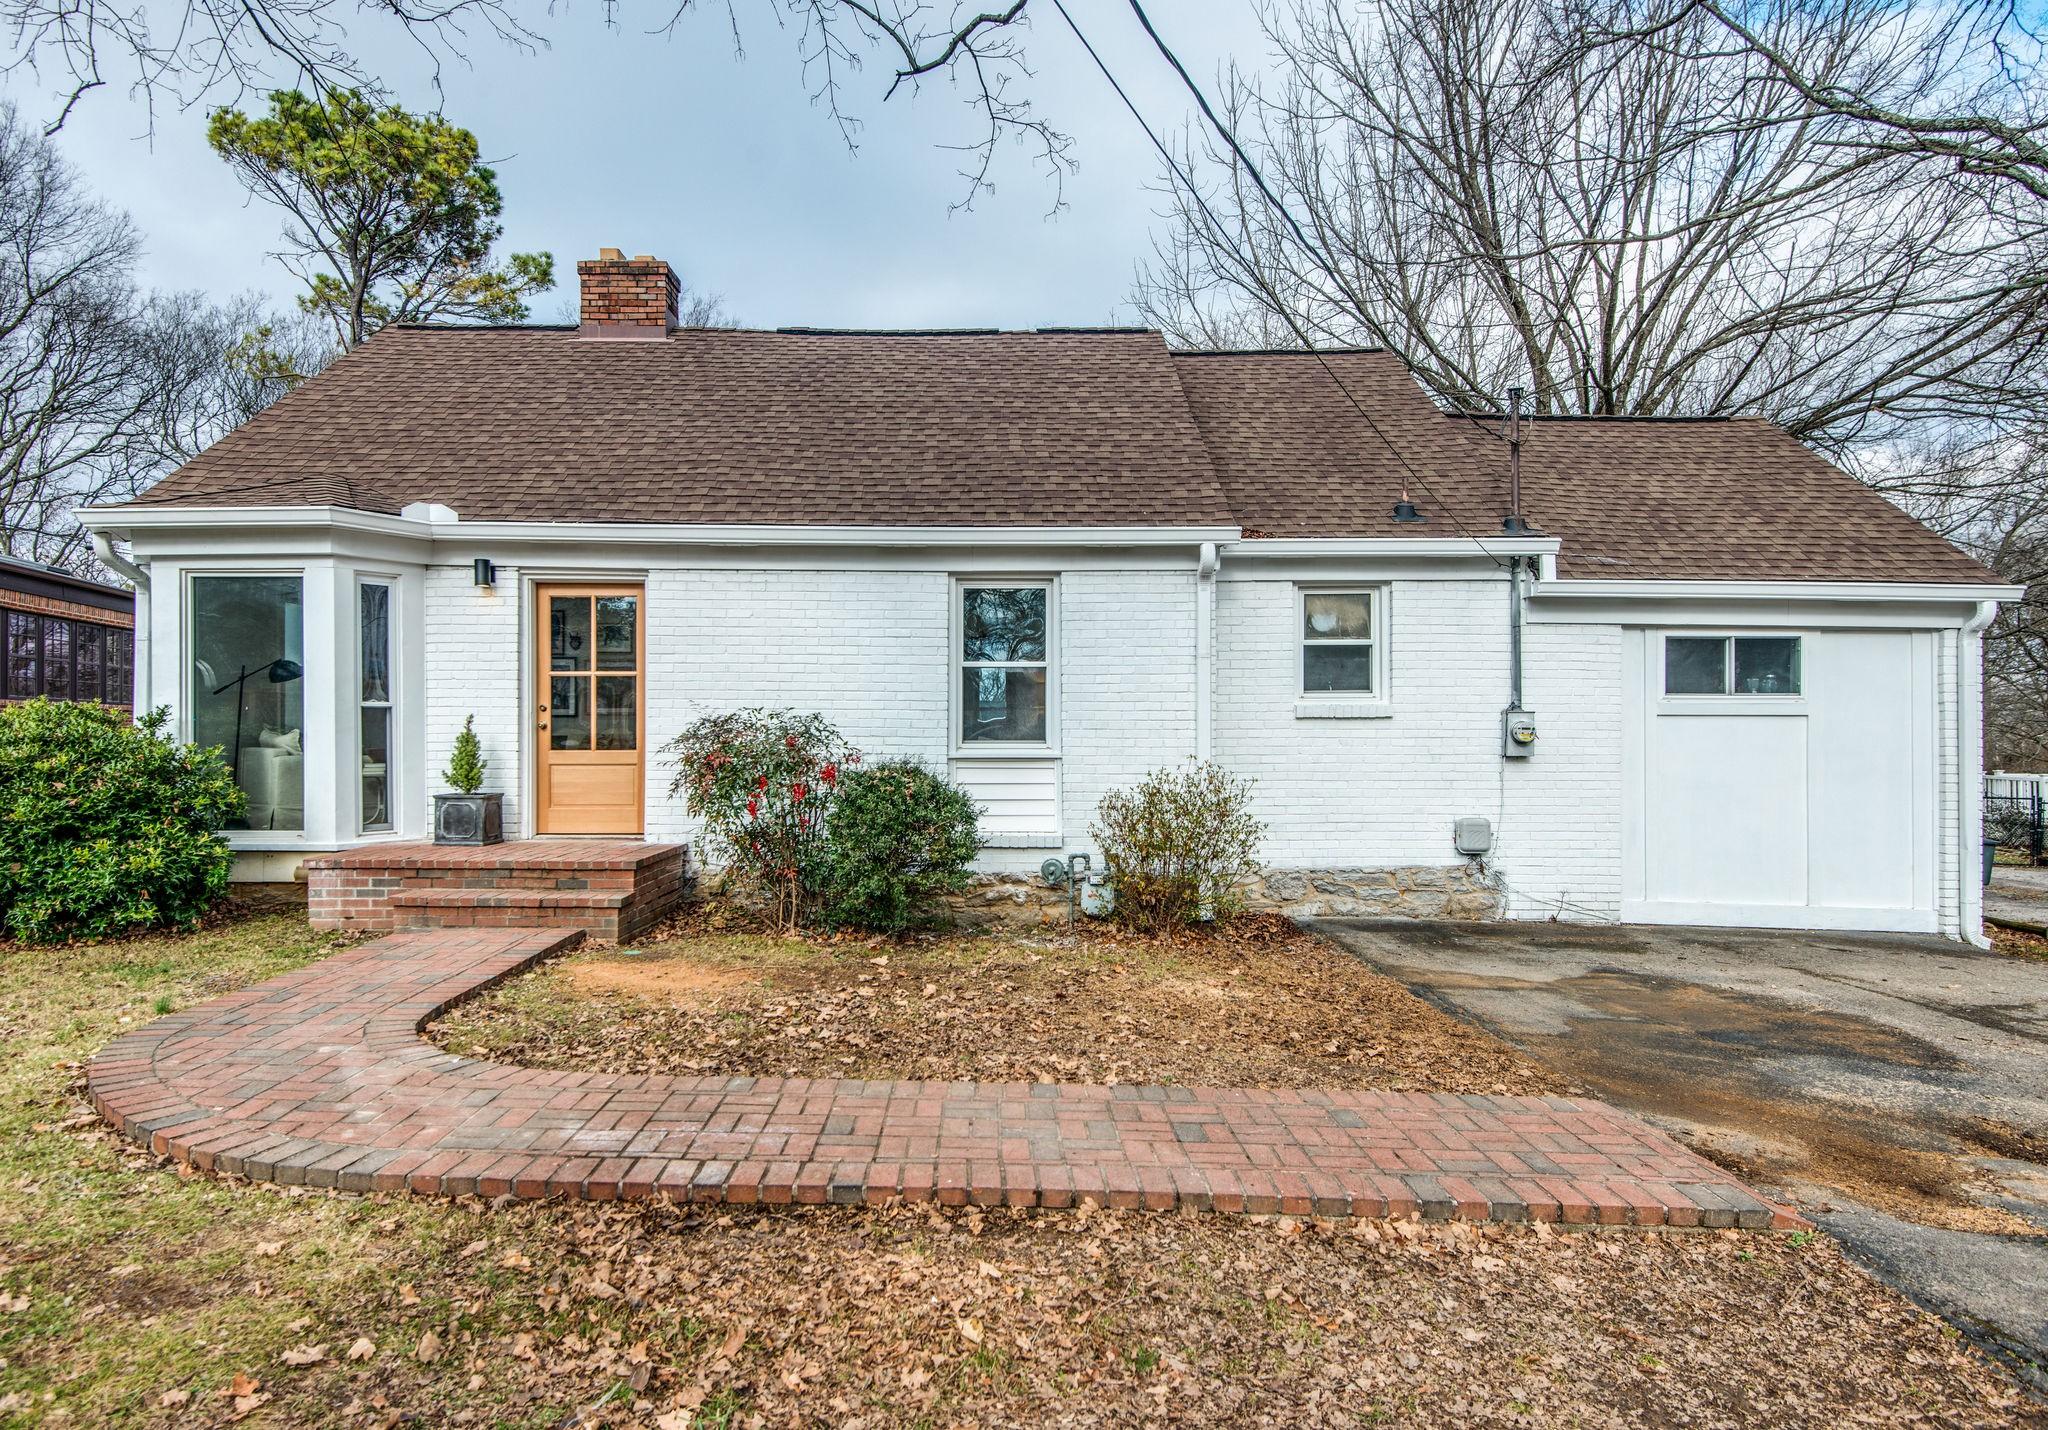 1219 Plymouth Ave, Nashville, TN 37216 - Nashville, TN real estate listing